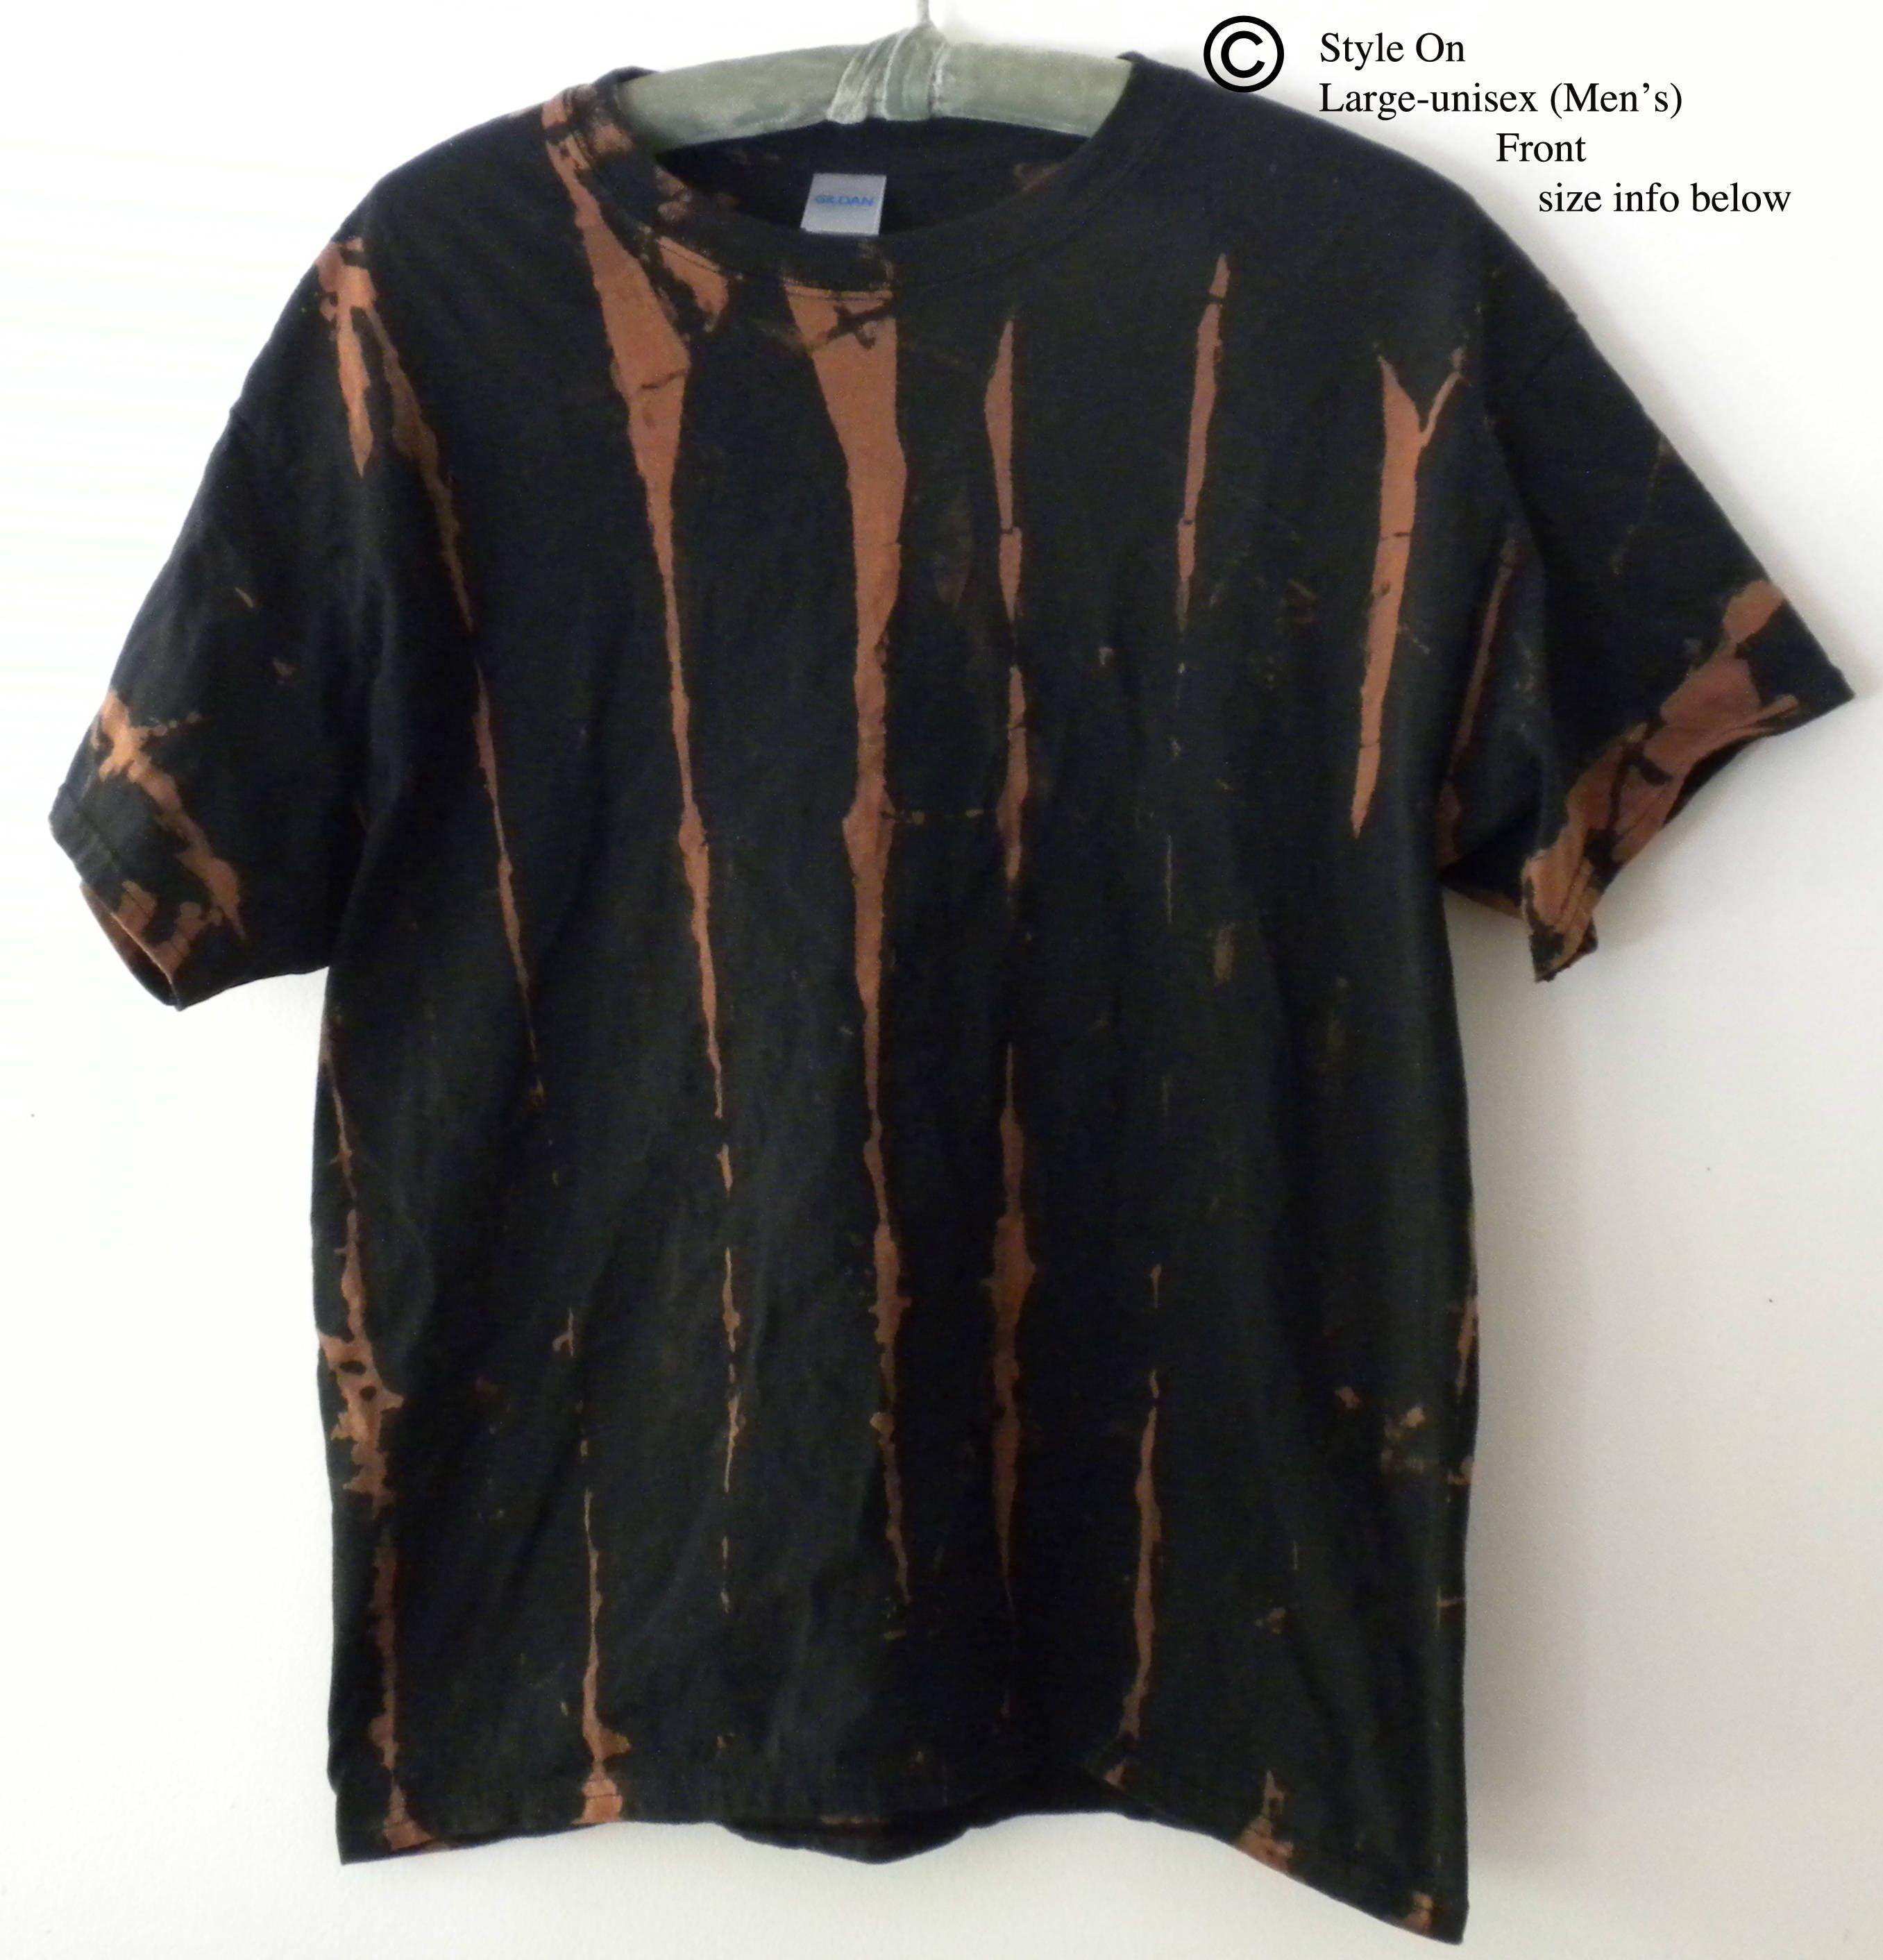 Black t shirt grunge - Acid Wash Tee Shirt Acid Wash T Shirt Black T Shirt Tie Dye Tee Shirt Grunge T Shirt Crop Tee Shirt Retro Hipster